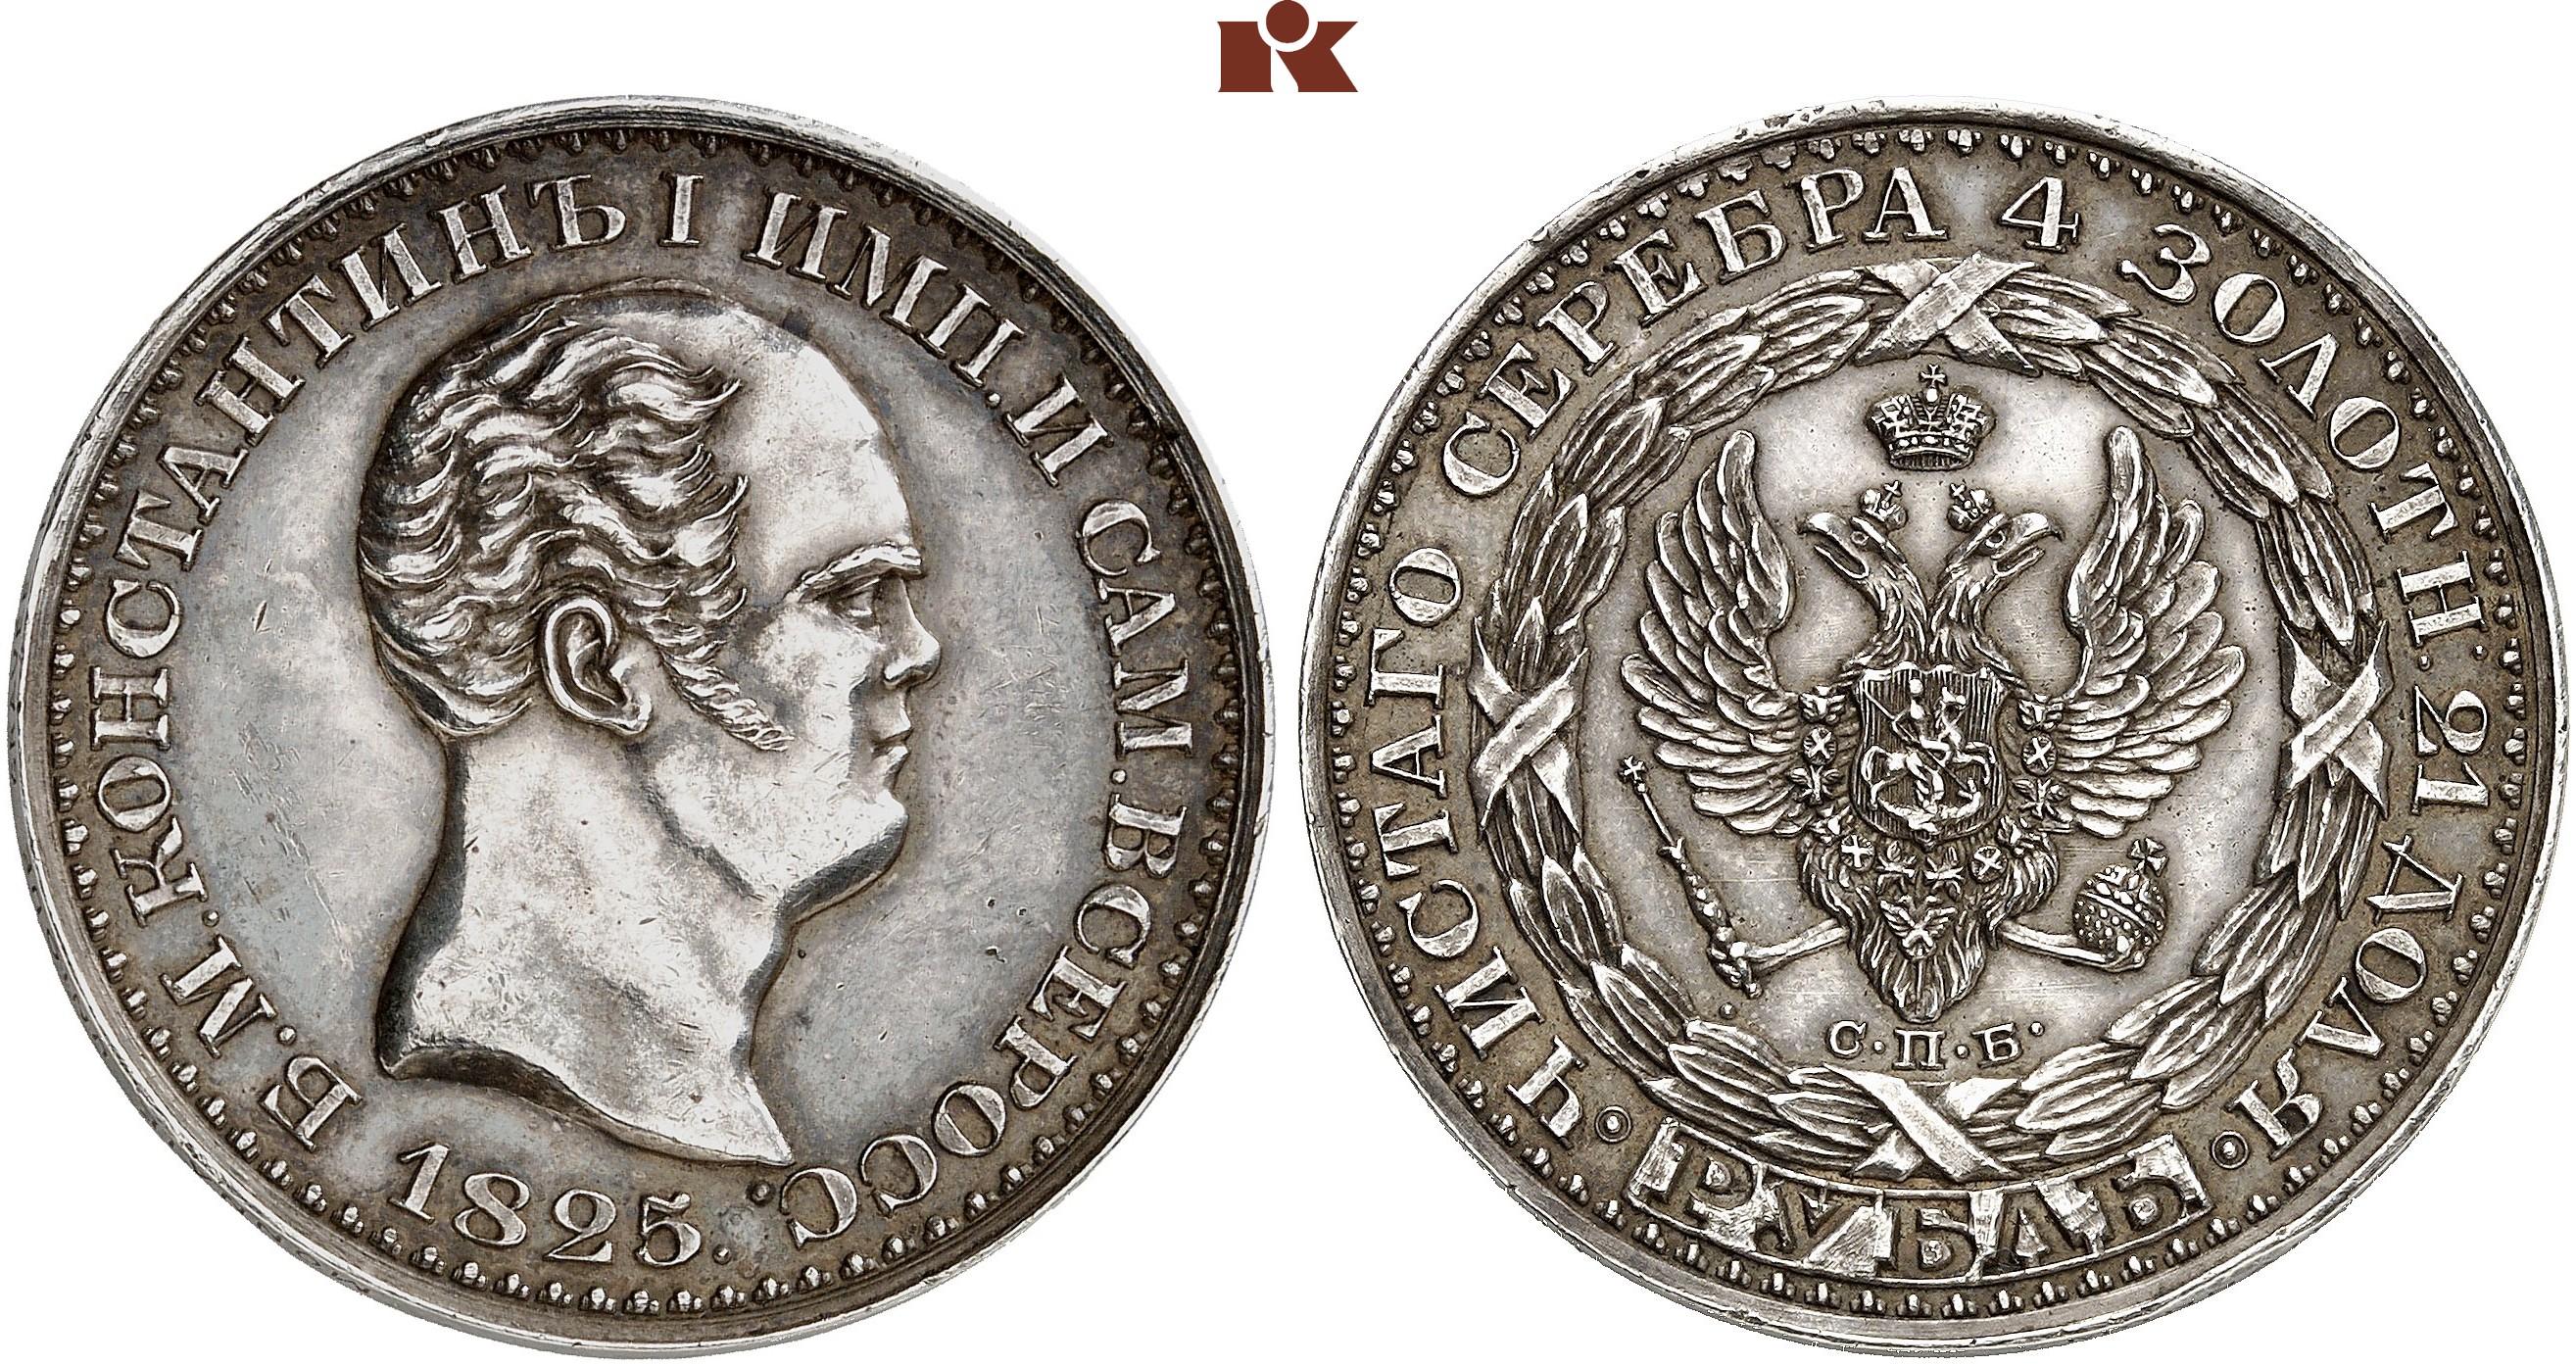 Konstantin I 1825 Silbermedaille O J Mit Gravur 1873 Im Rand